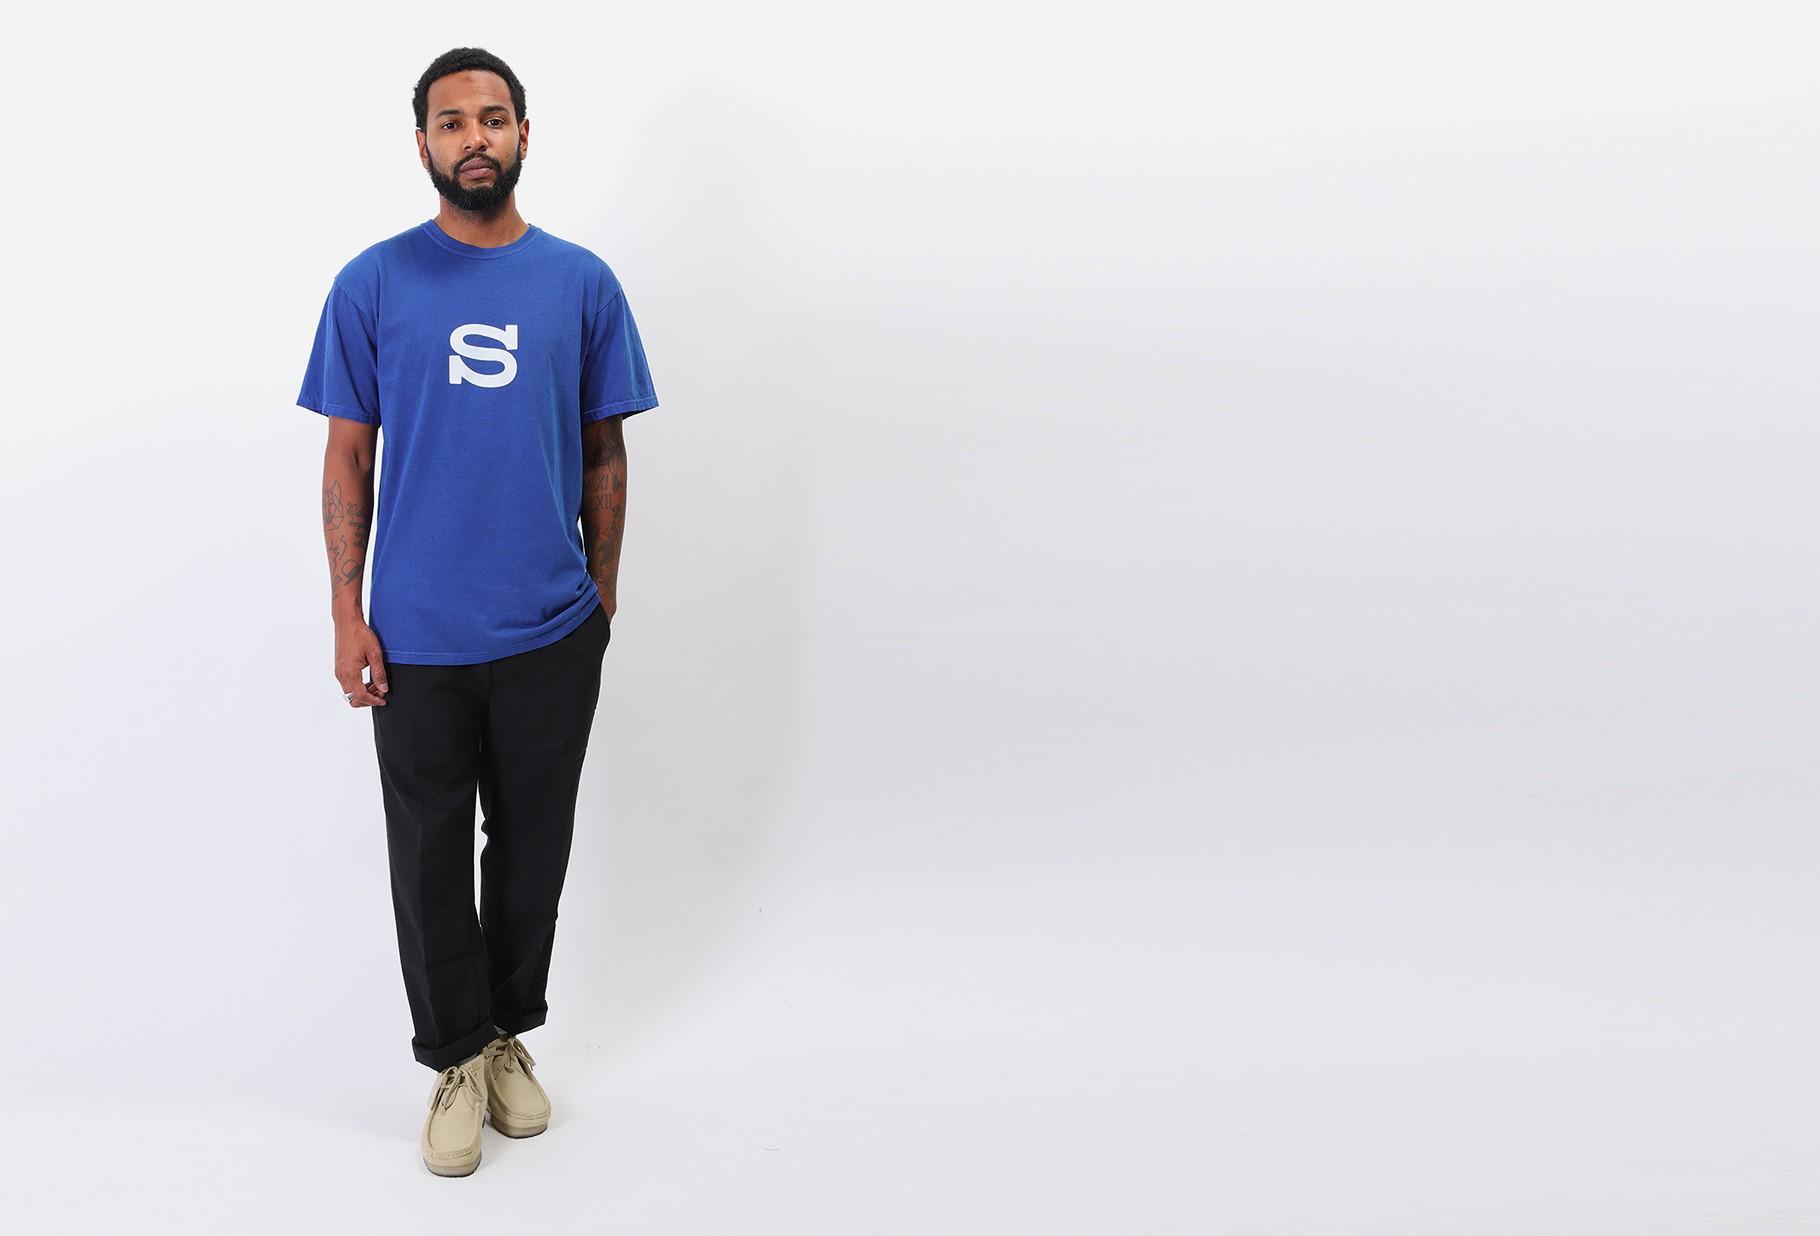 STUSSY / S sport tee Dark blue